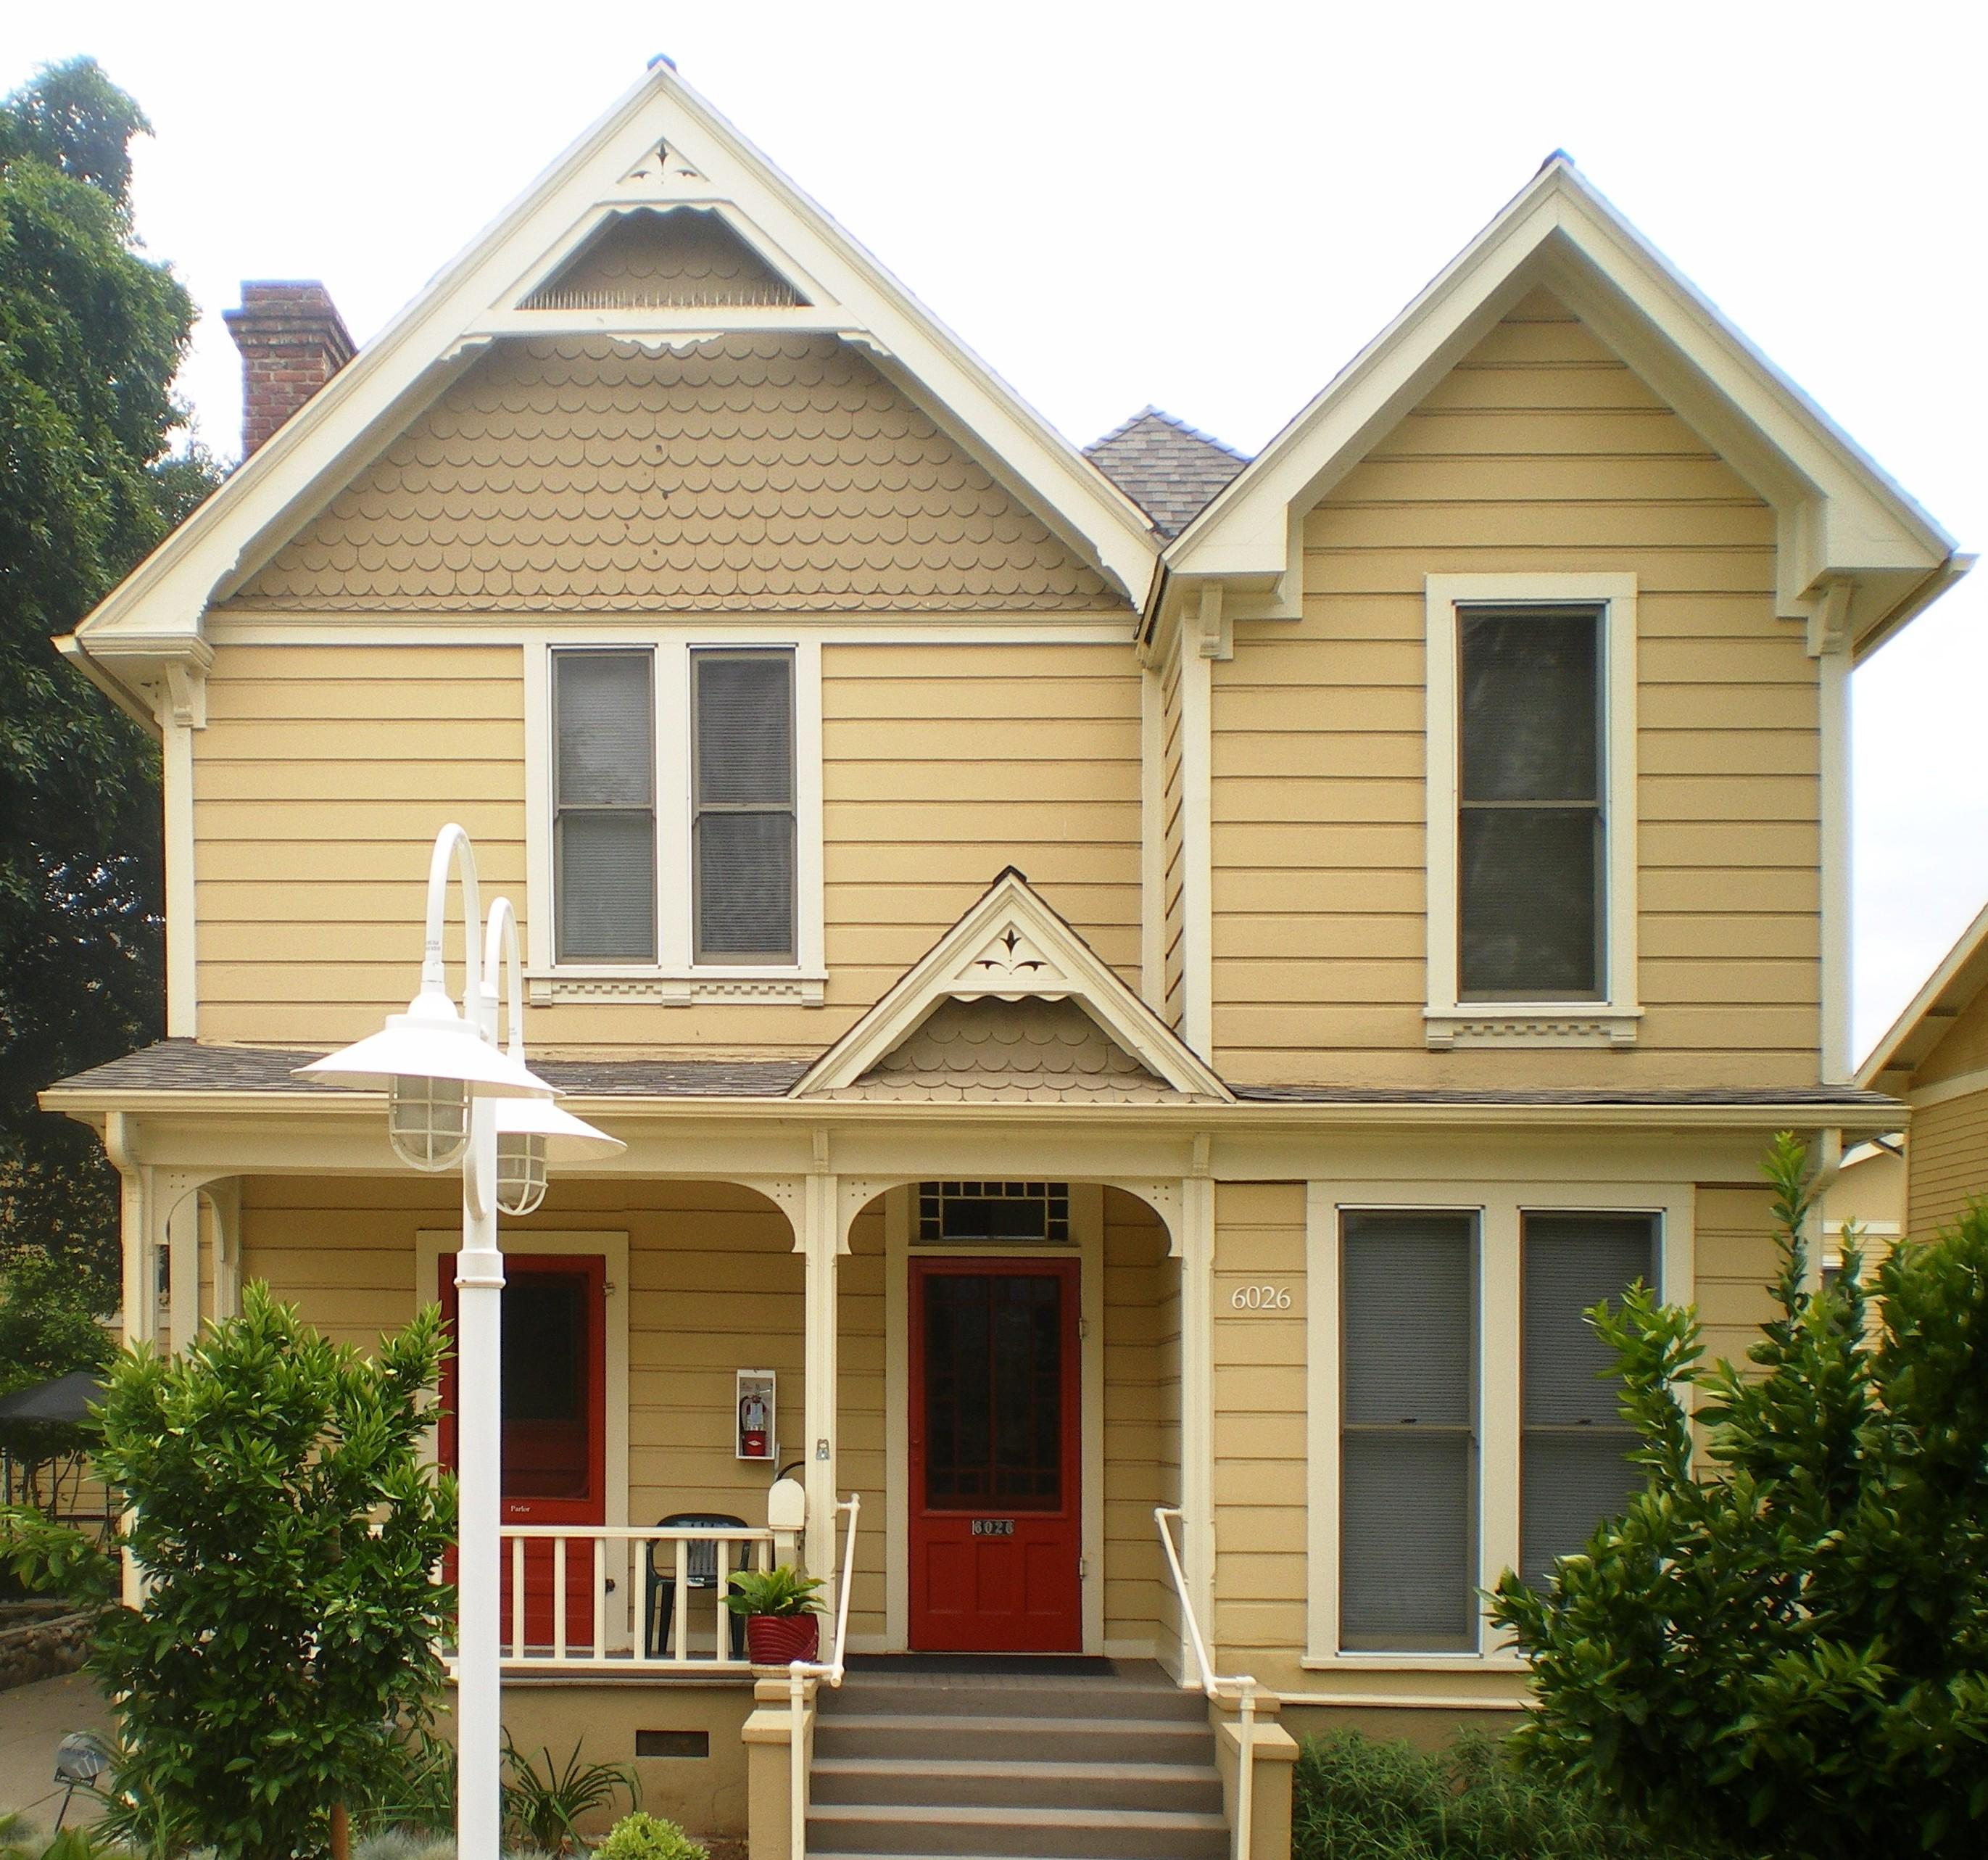 Filepisgah Home Historic District, Highland Parkjpg